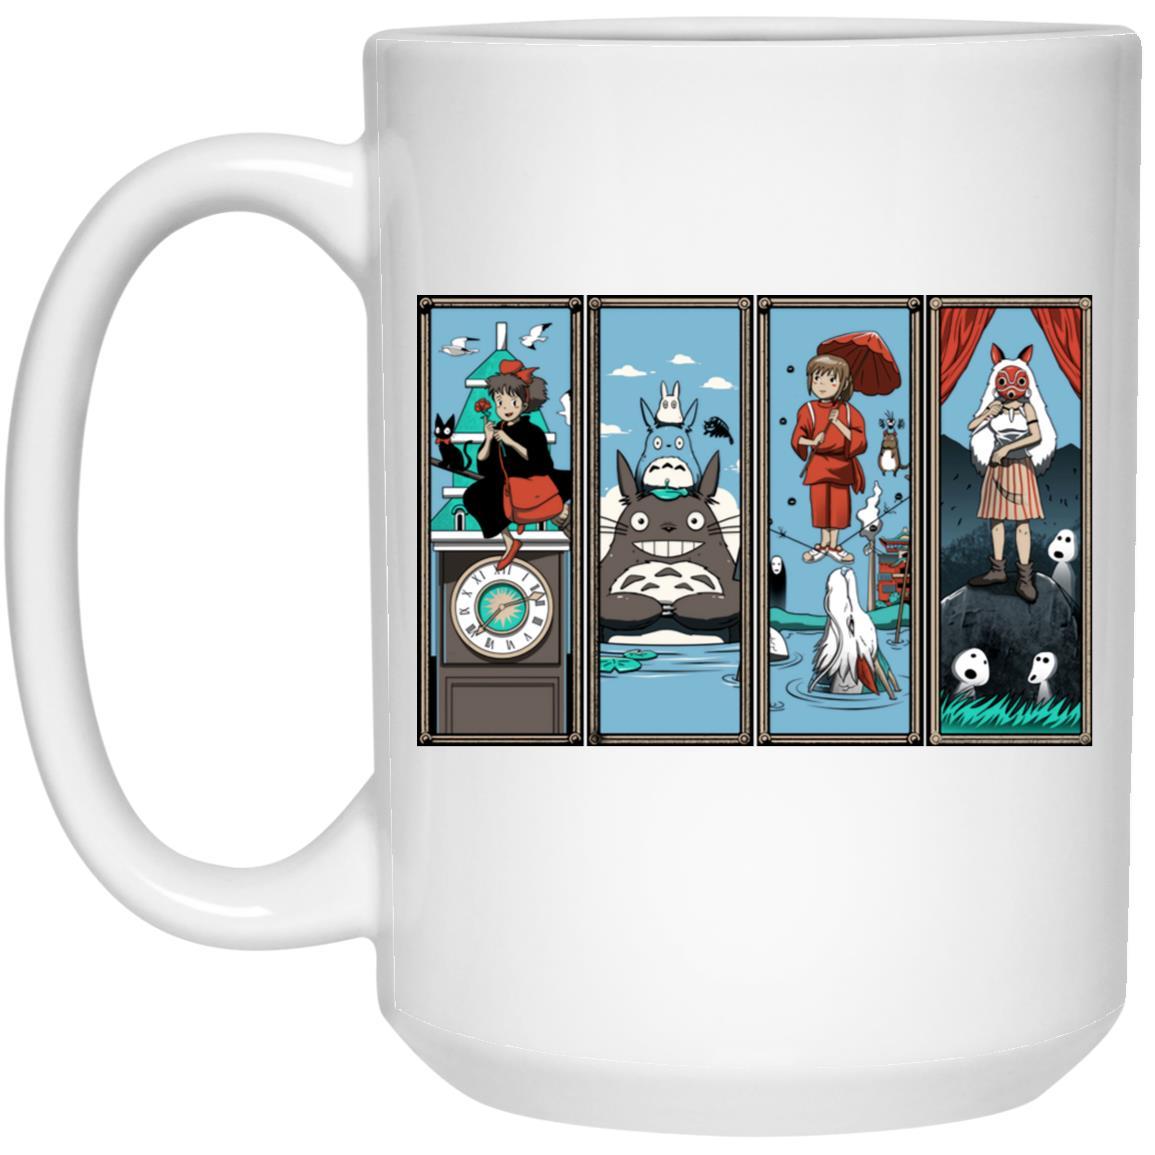 Ghibli Most Famous Movies Collection Mug